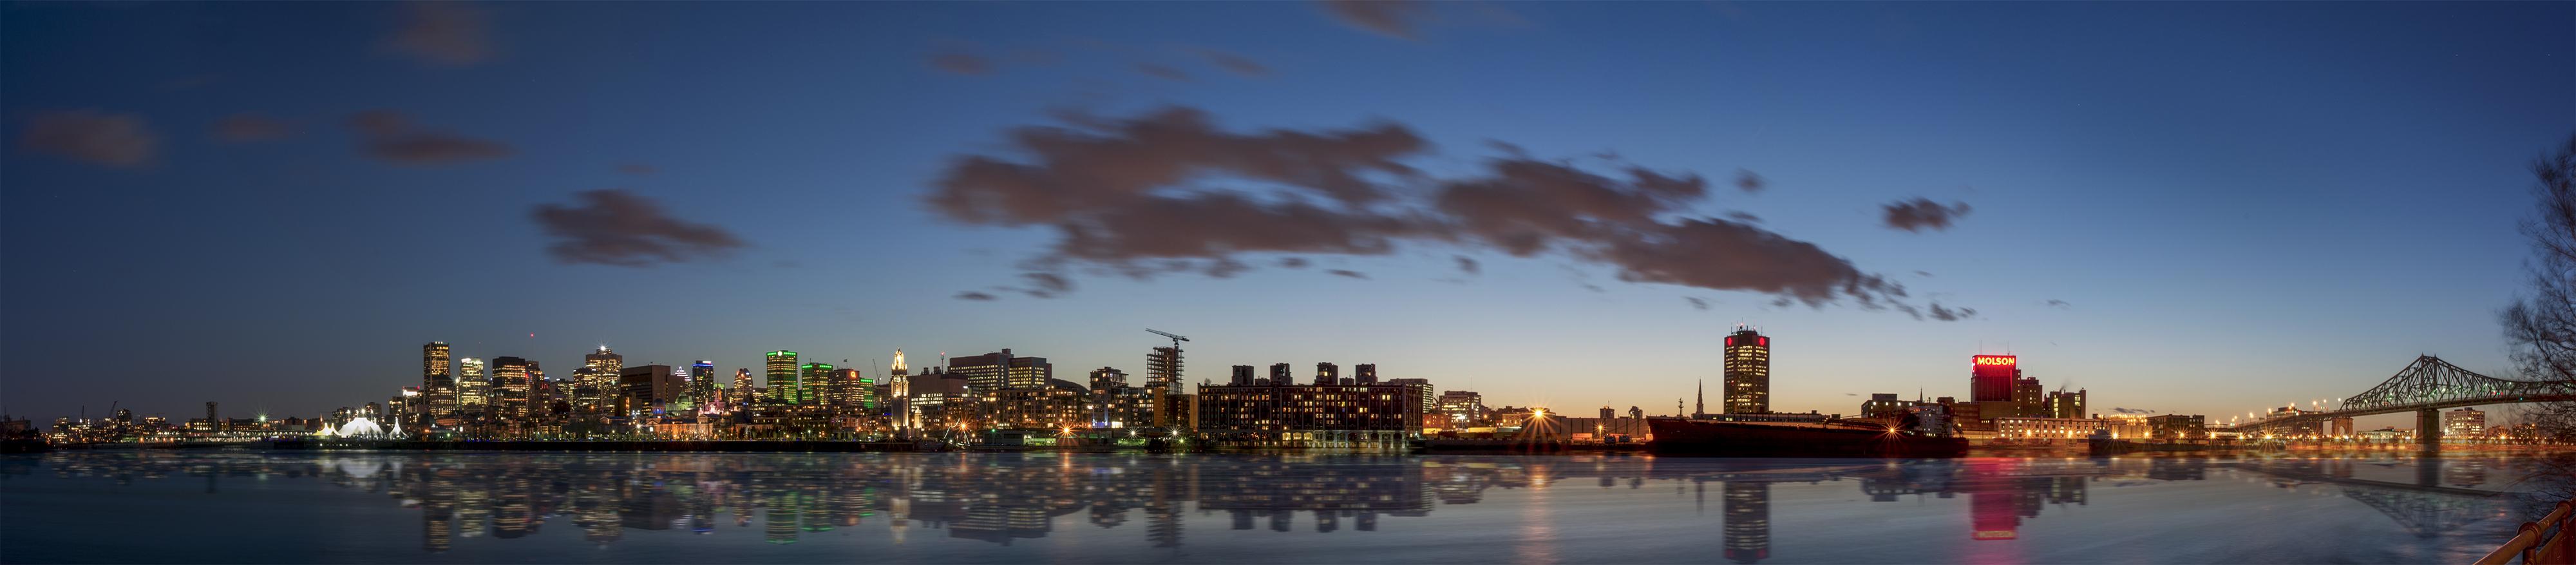 skyline ville au canada